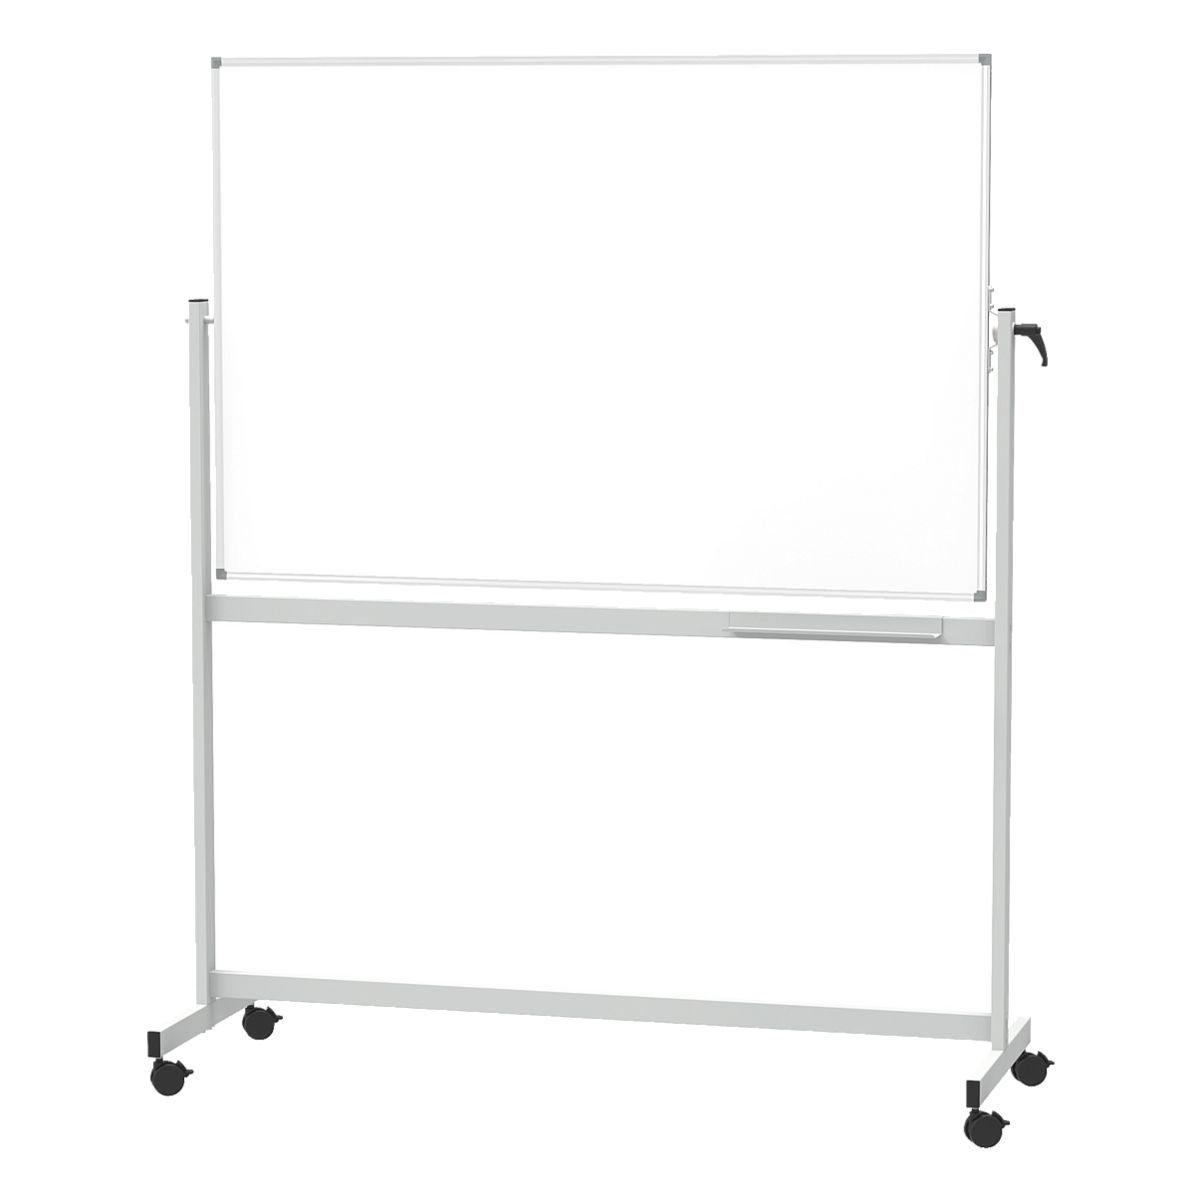 Maul Whiteboard emailliert, 220 x 120 cm »Maul Standard 6460684«